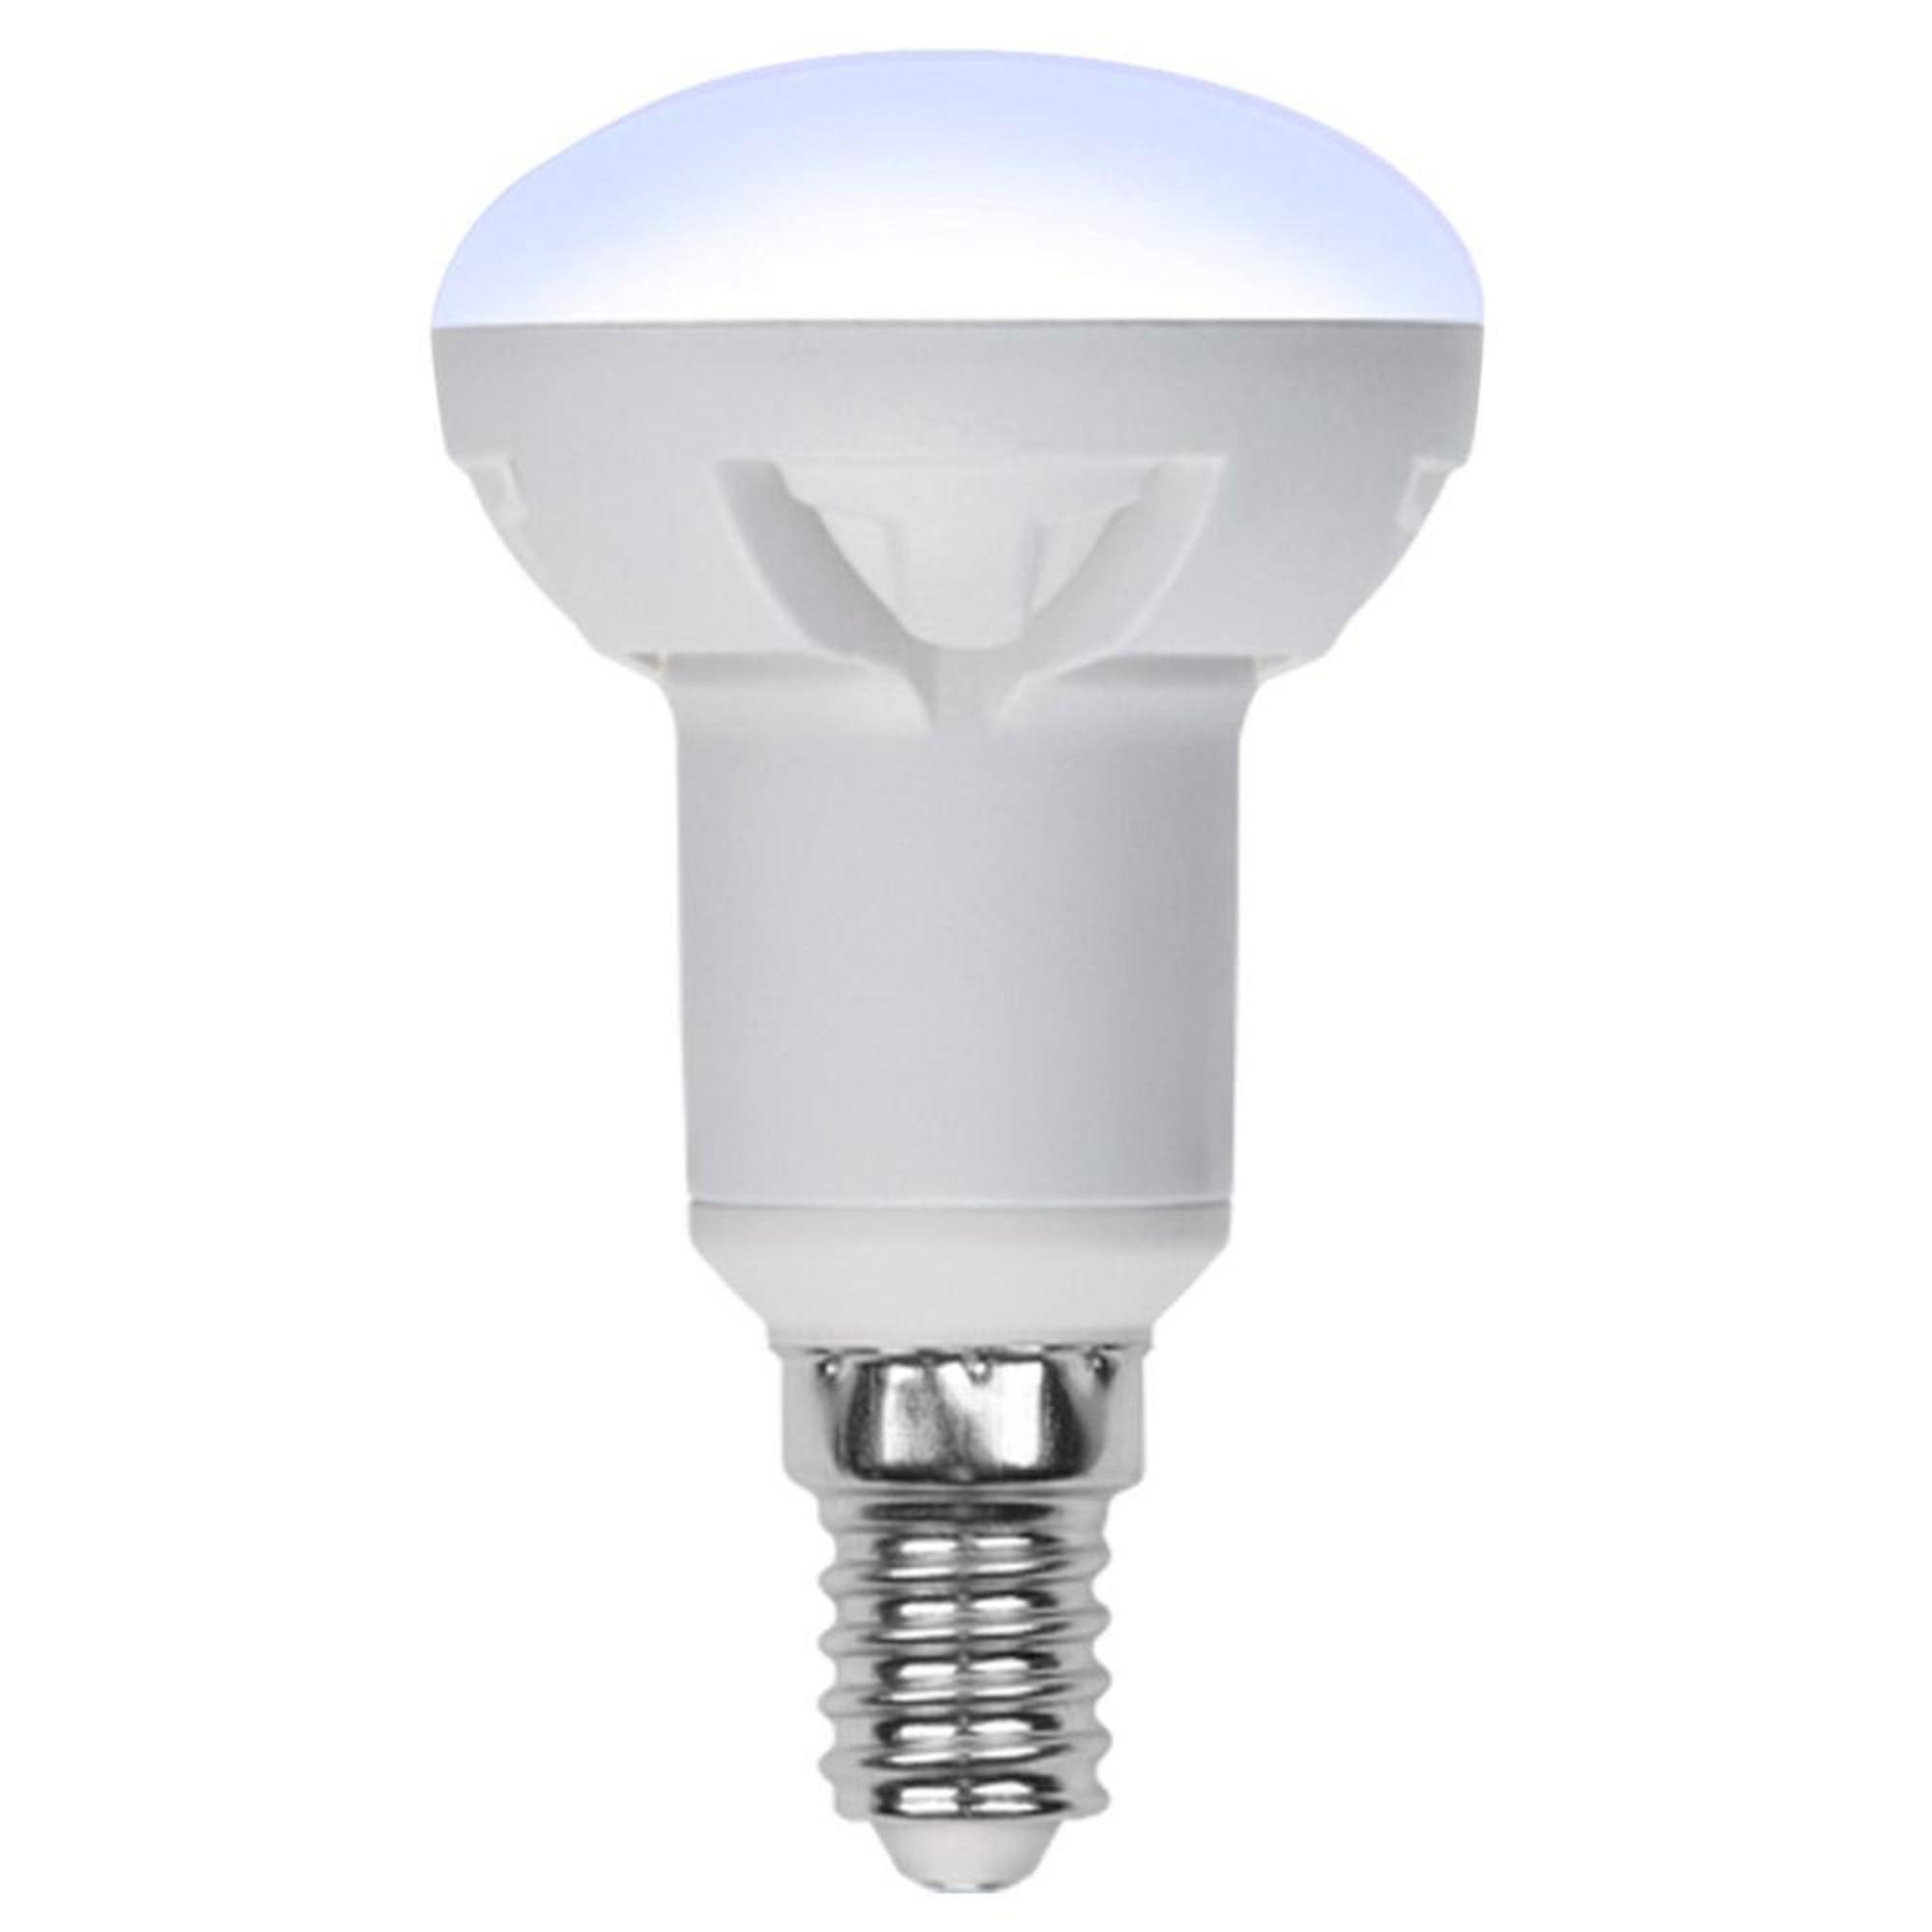 Лампа светодиодная Uniel Яркая Dimmable E14 рефлекторная 600 Лм 7 Вт теплый белый (желтый)